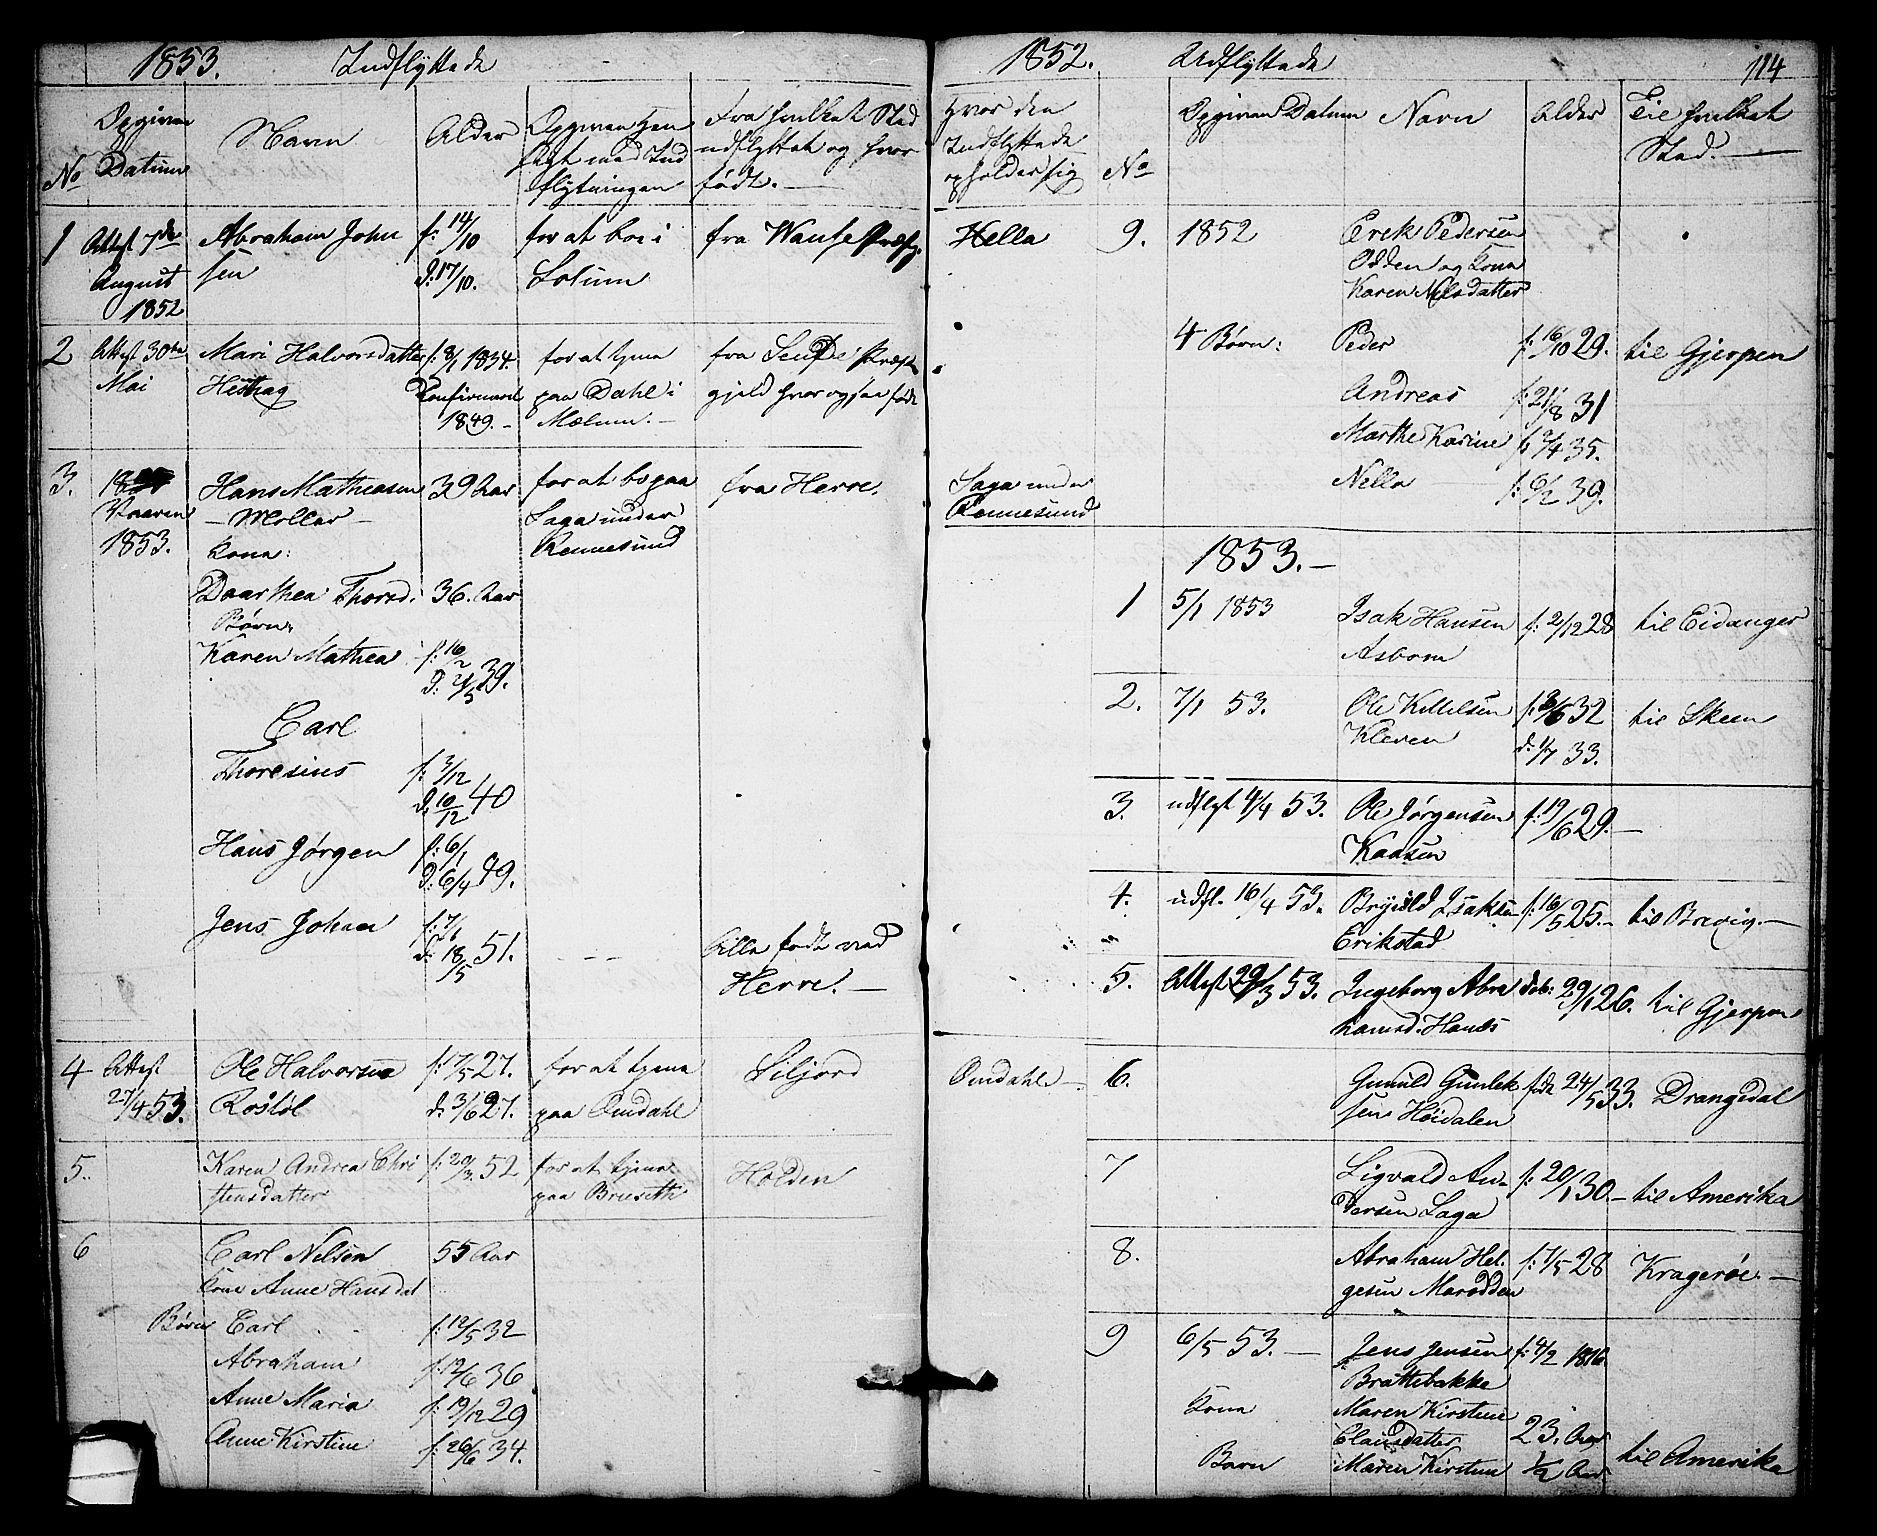 SAKO, Solum kirkebøker, G/Gb/L0001: Klokkerbok nr. II 1, 1848-1859, s. 114